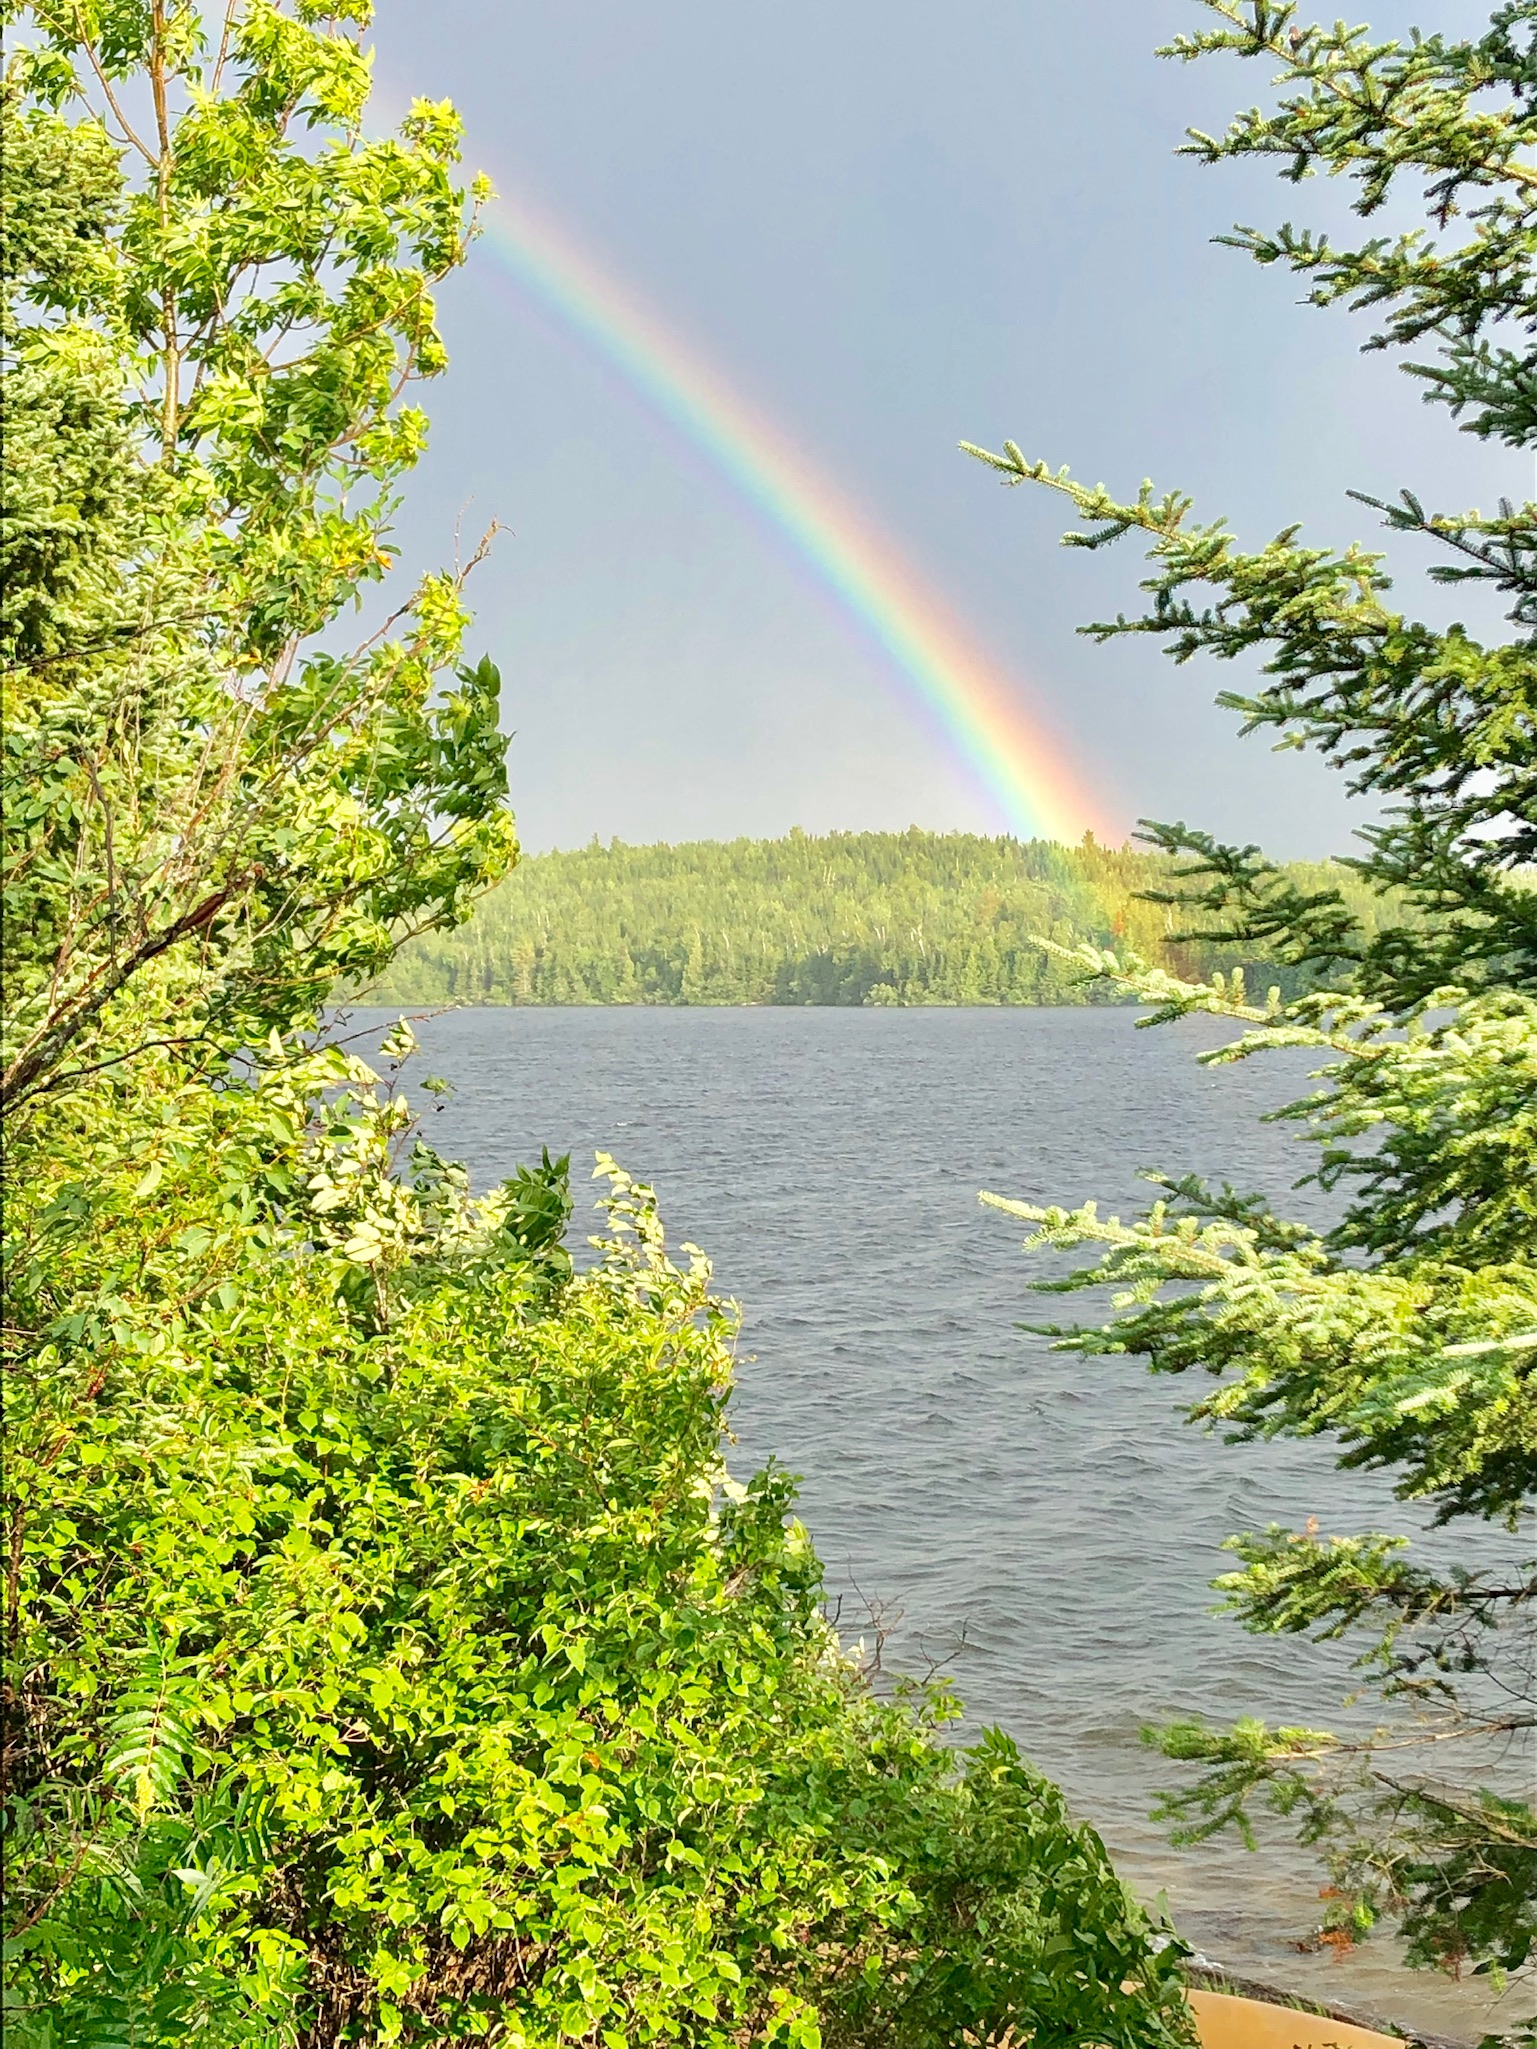 - We love rainbows.